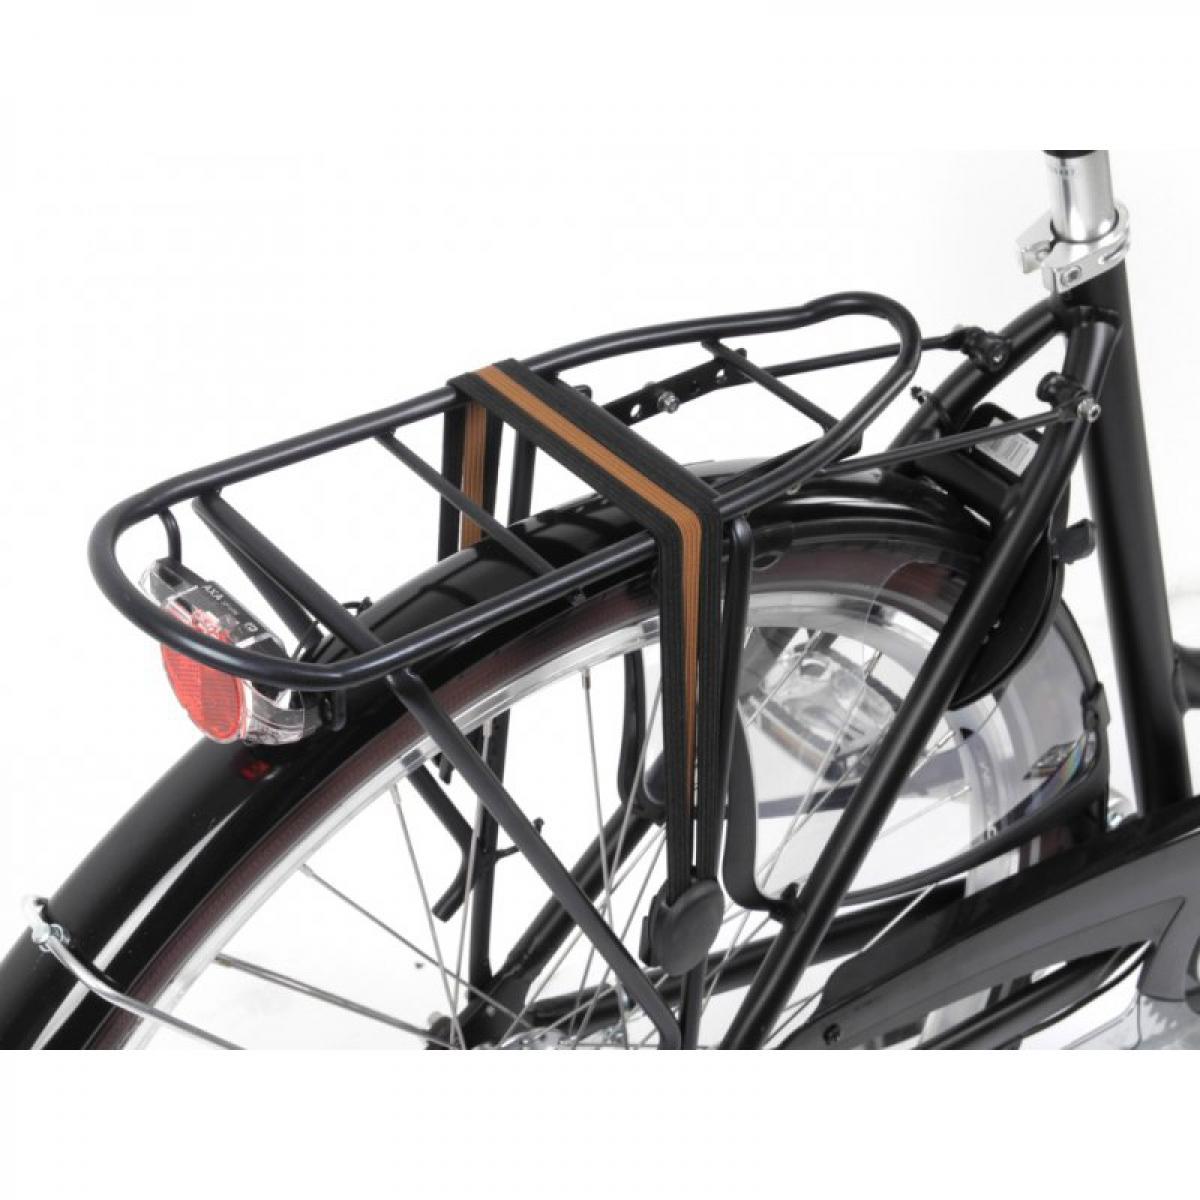 28 zoll alu damen fahrrad 7 gang shimano nexus nabendynamo korb retro classic schwarz ihr. Black Bedroom Furniture Sets. Home Design Ideas